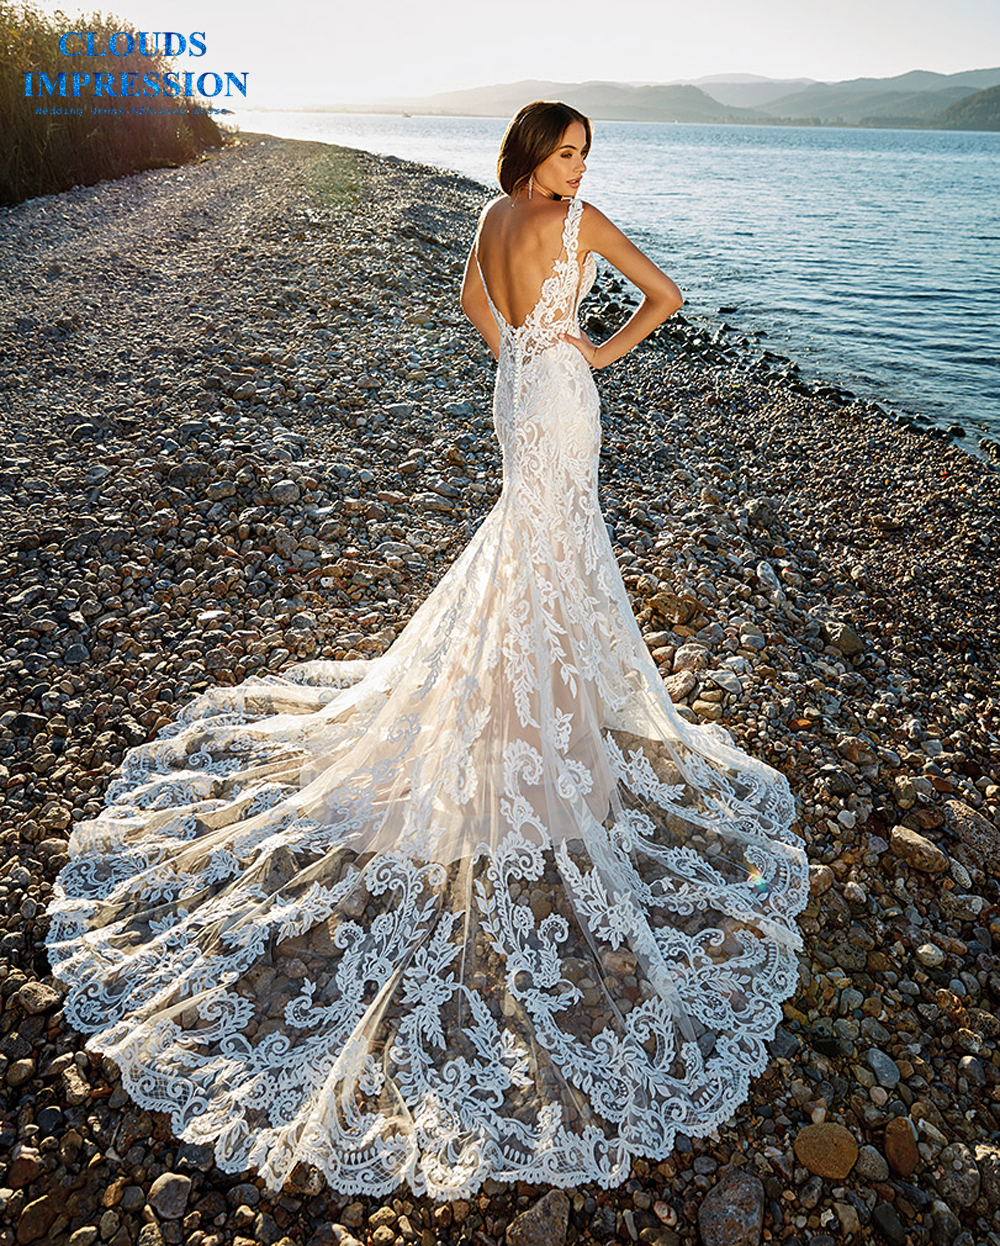 CLOUDS IMPRESSION Romantic Chapel Train Mermaid Wedding Dress 2019 V-neck Beading Beach Lace Bride Dress Vestige De Noiva